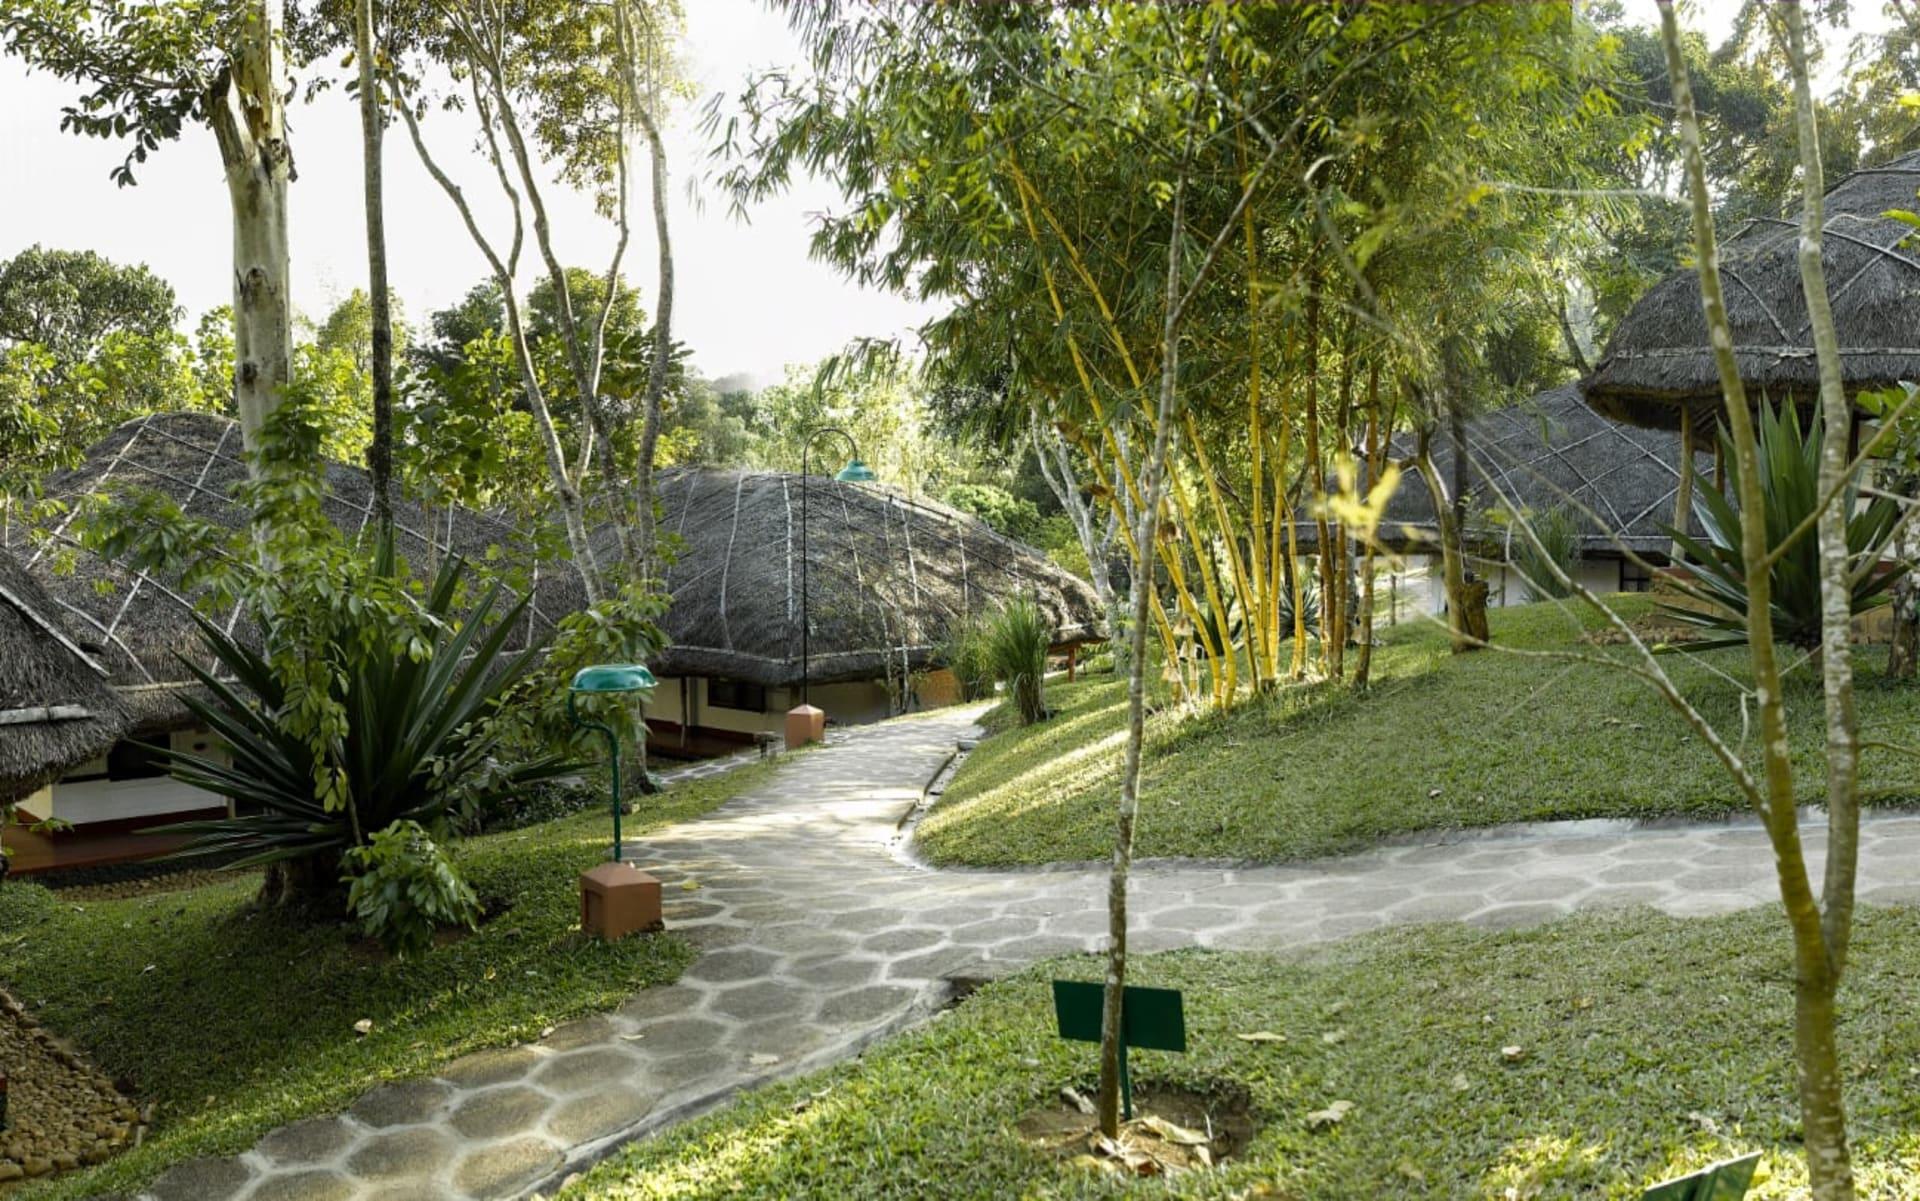 Spice Village in Thekkady: Walkways